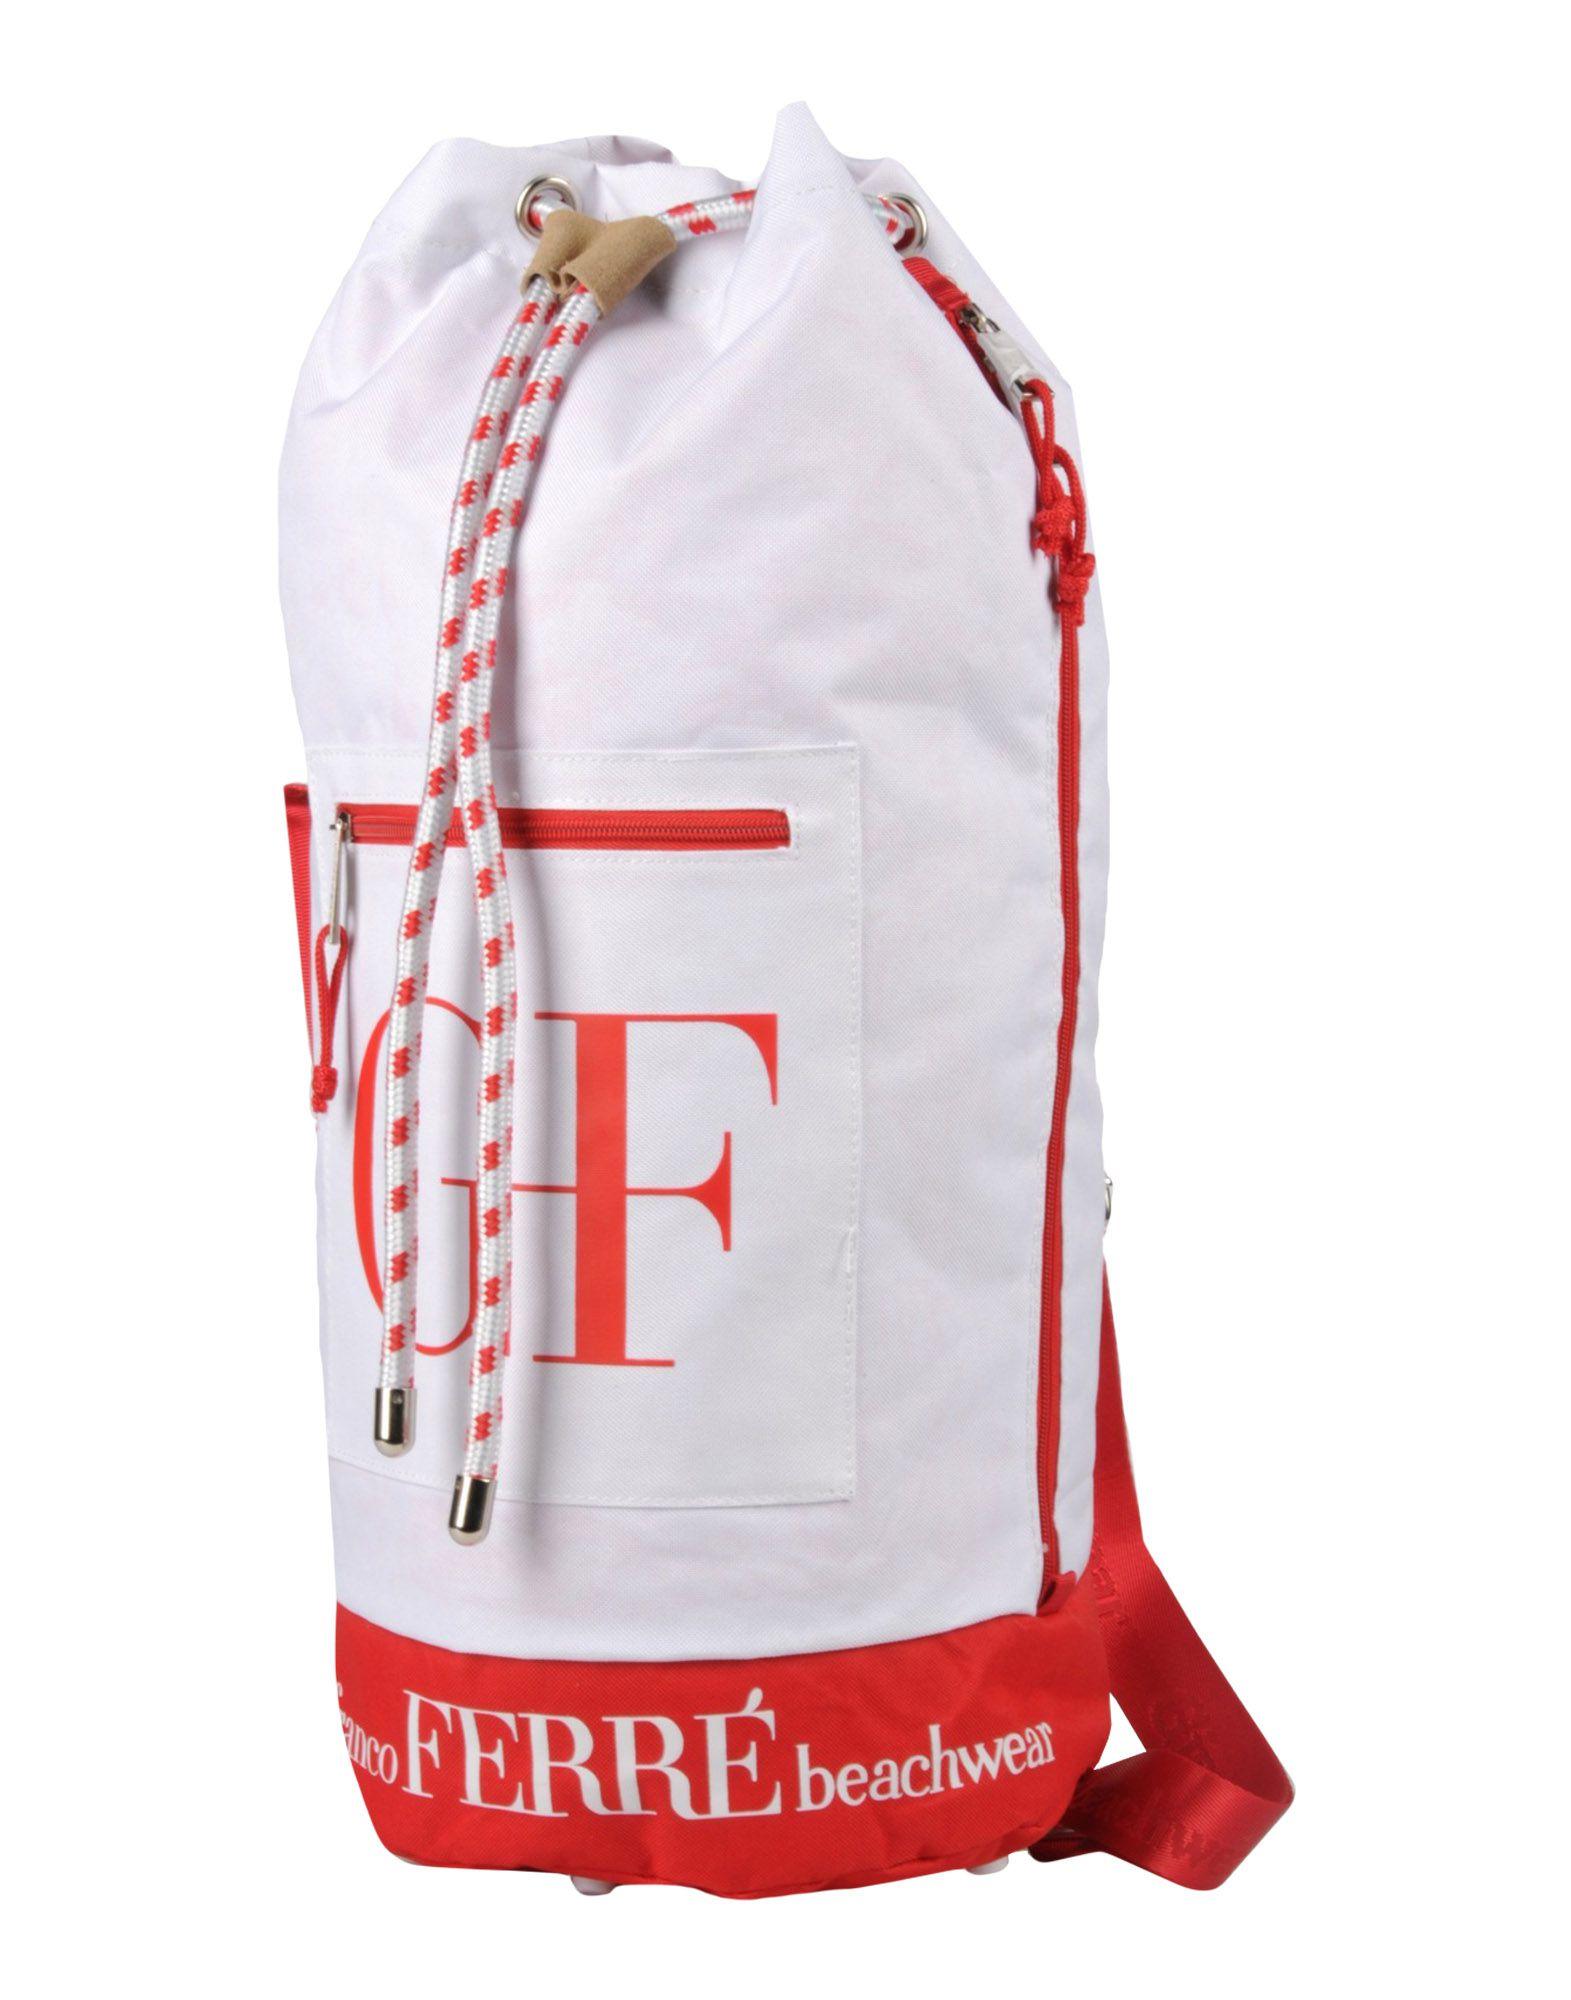 GIANFRANCO FERRE' BEACHWEAR Рюкзаки и сумки на пояс gianfranco ferre beachwear бермуды